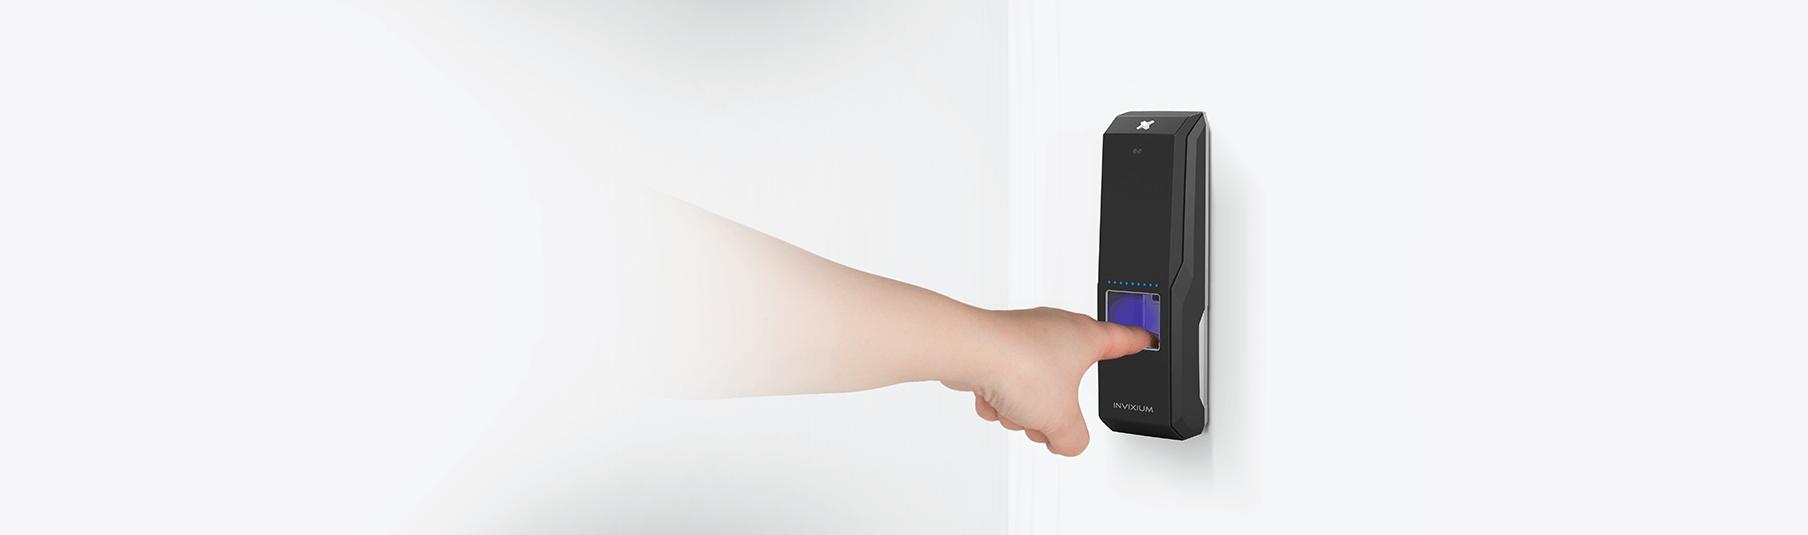 Sense2 access control fingerprint reader